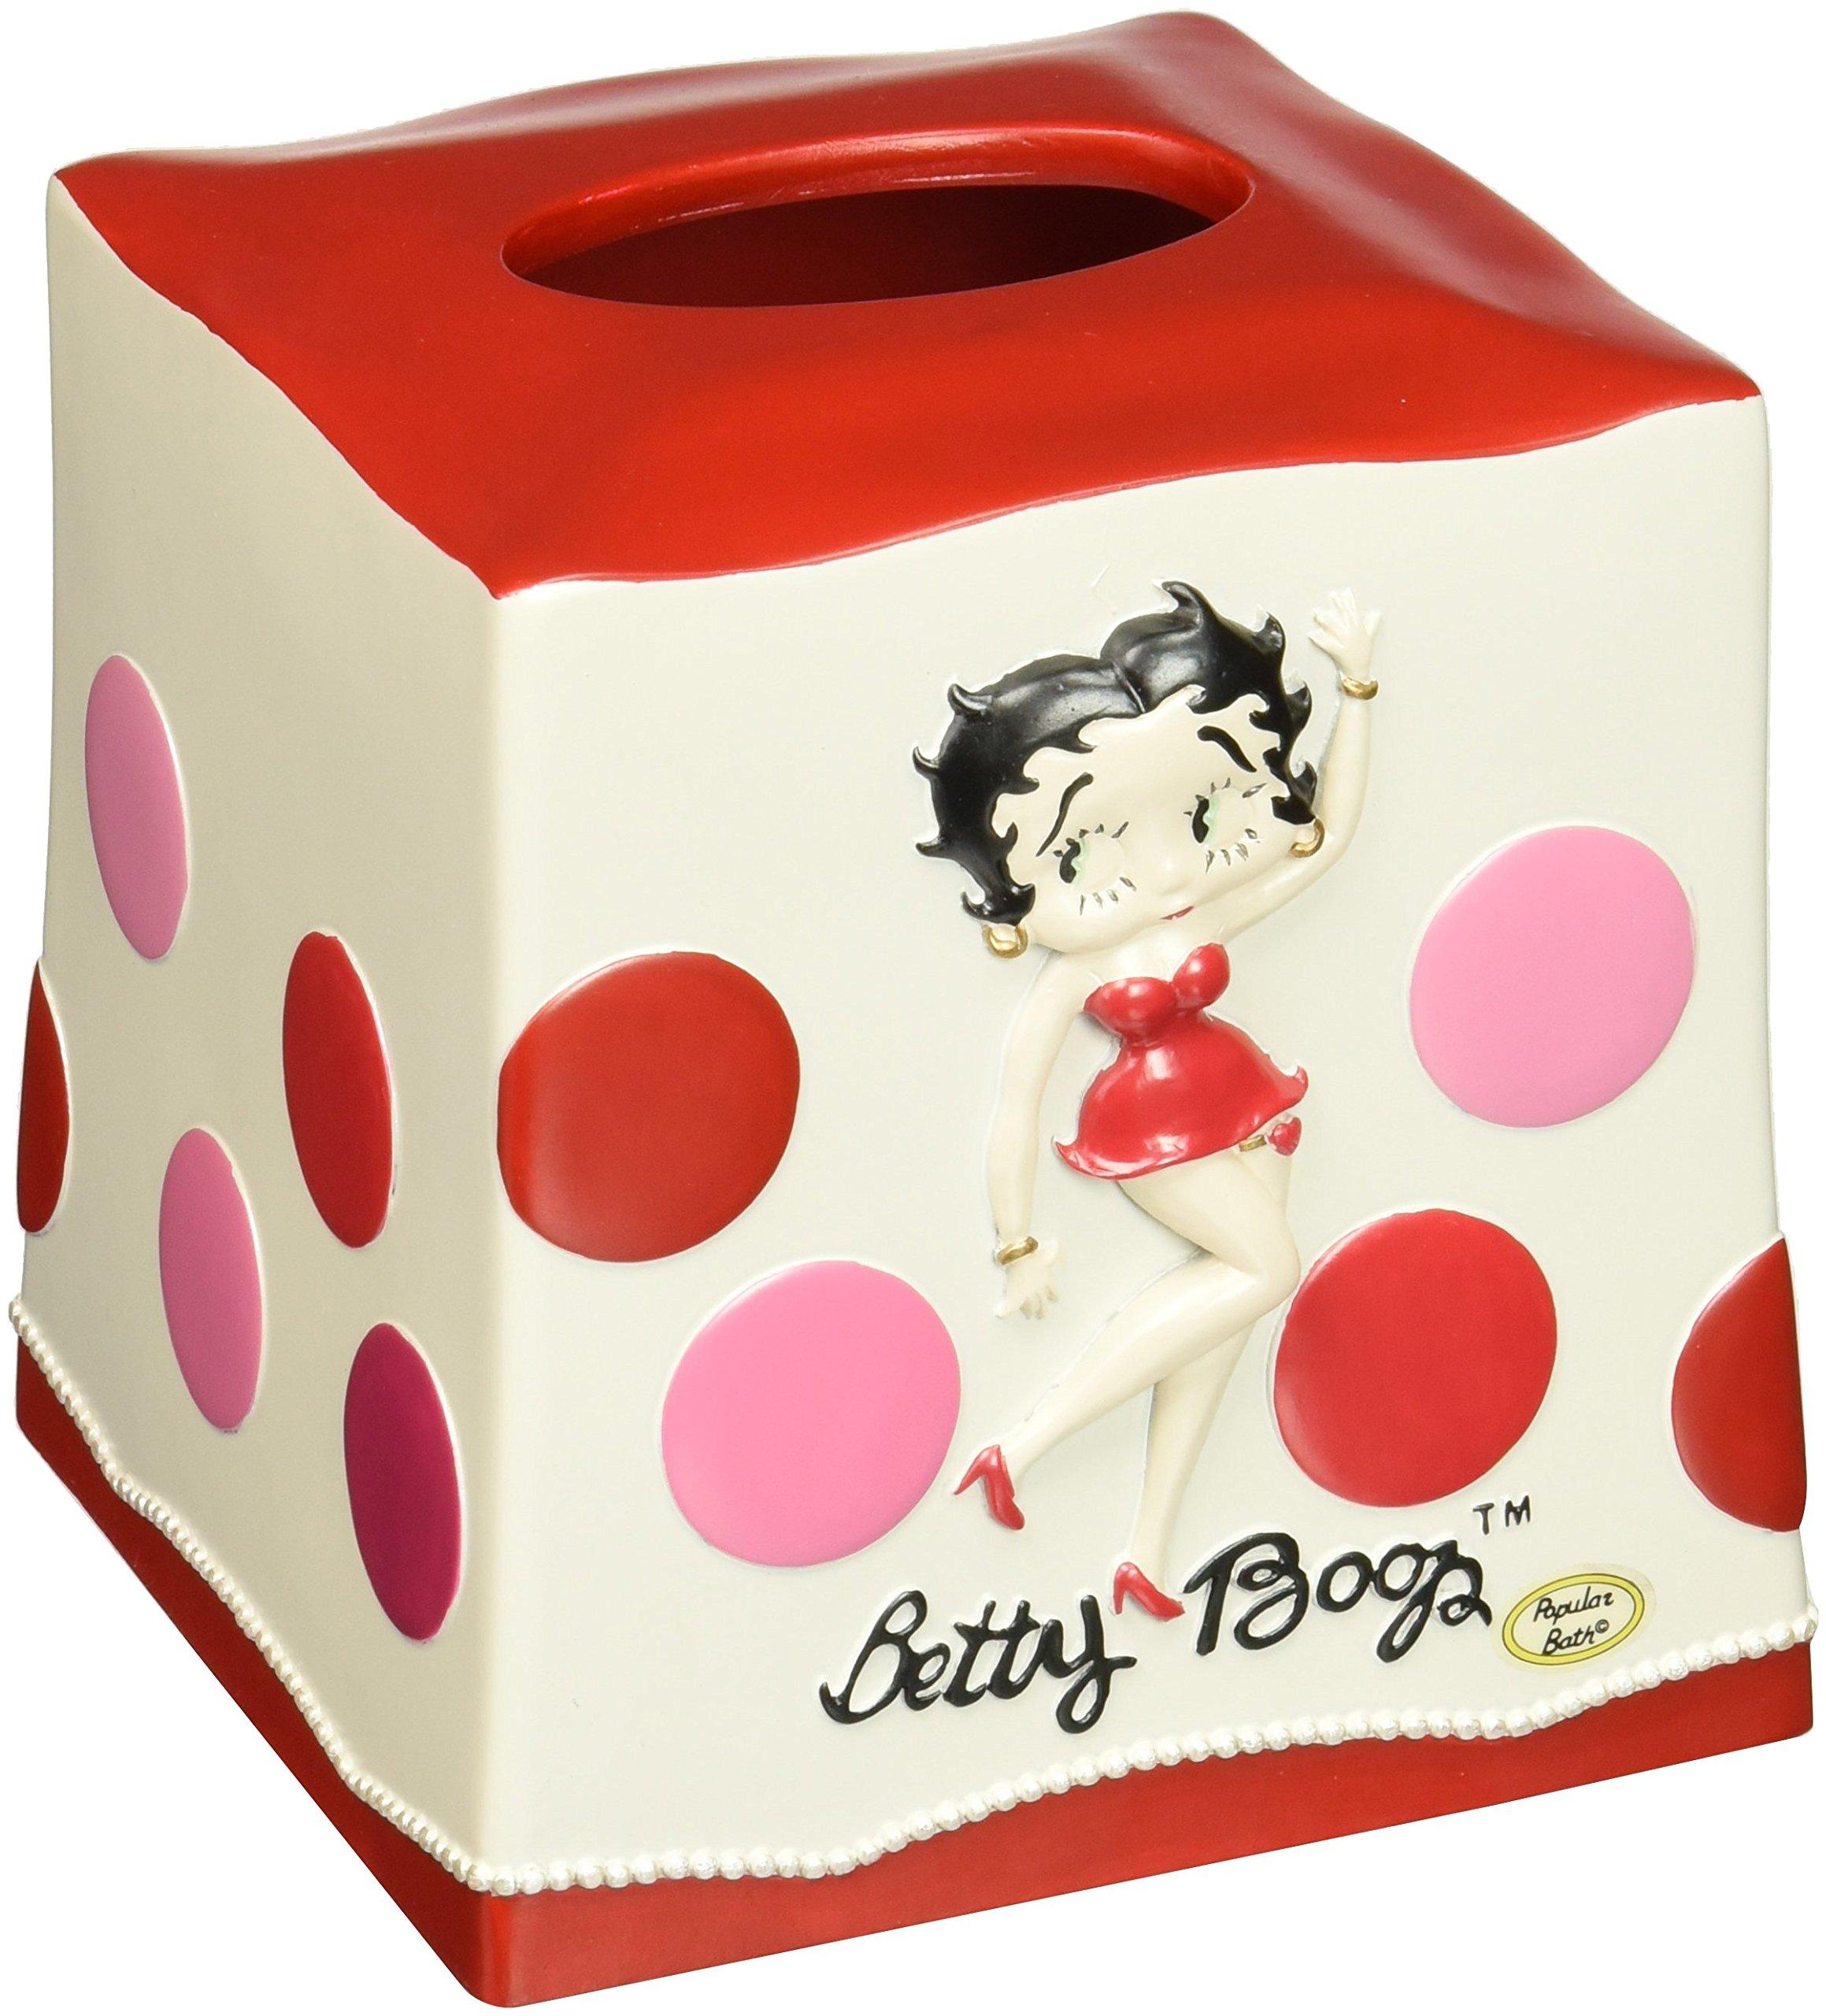 Popular Bath Hello Betty Tissue Box